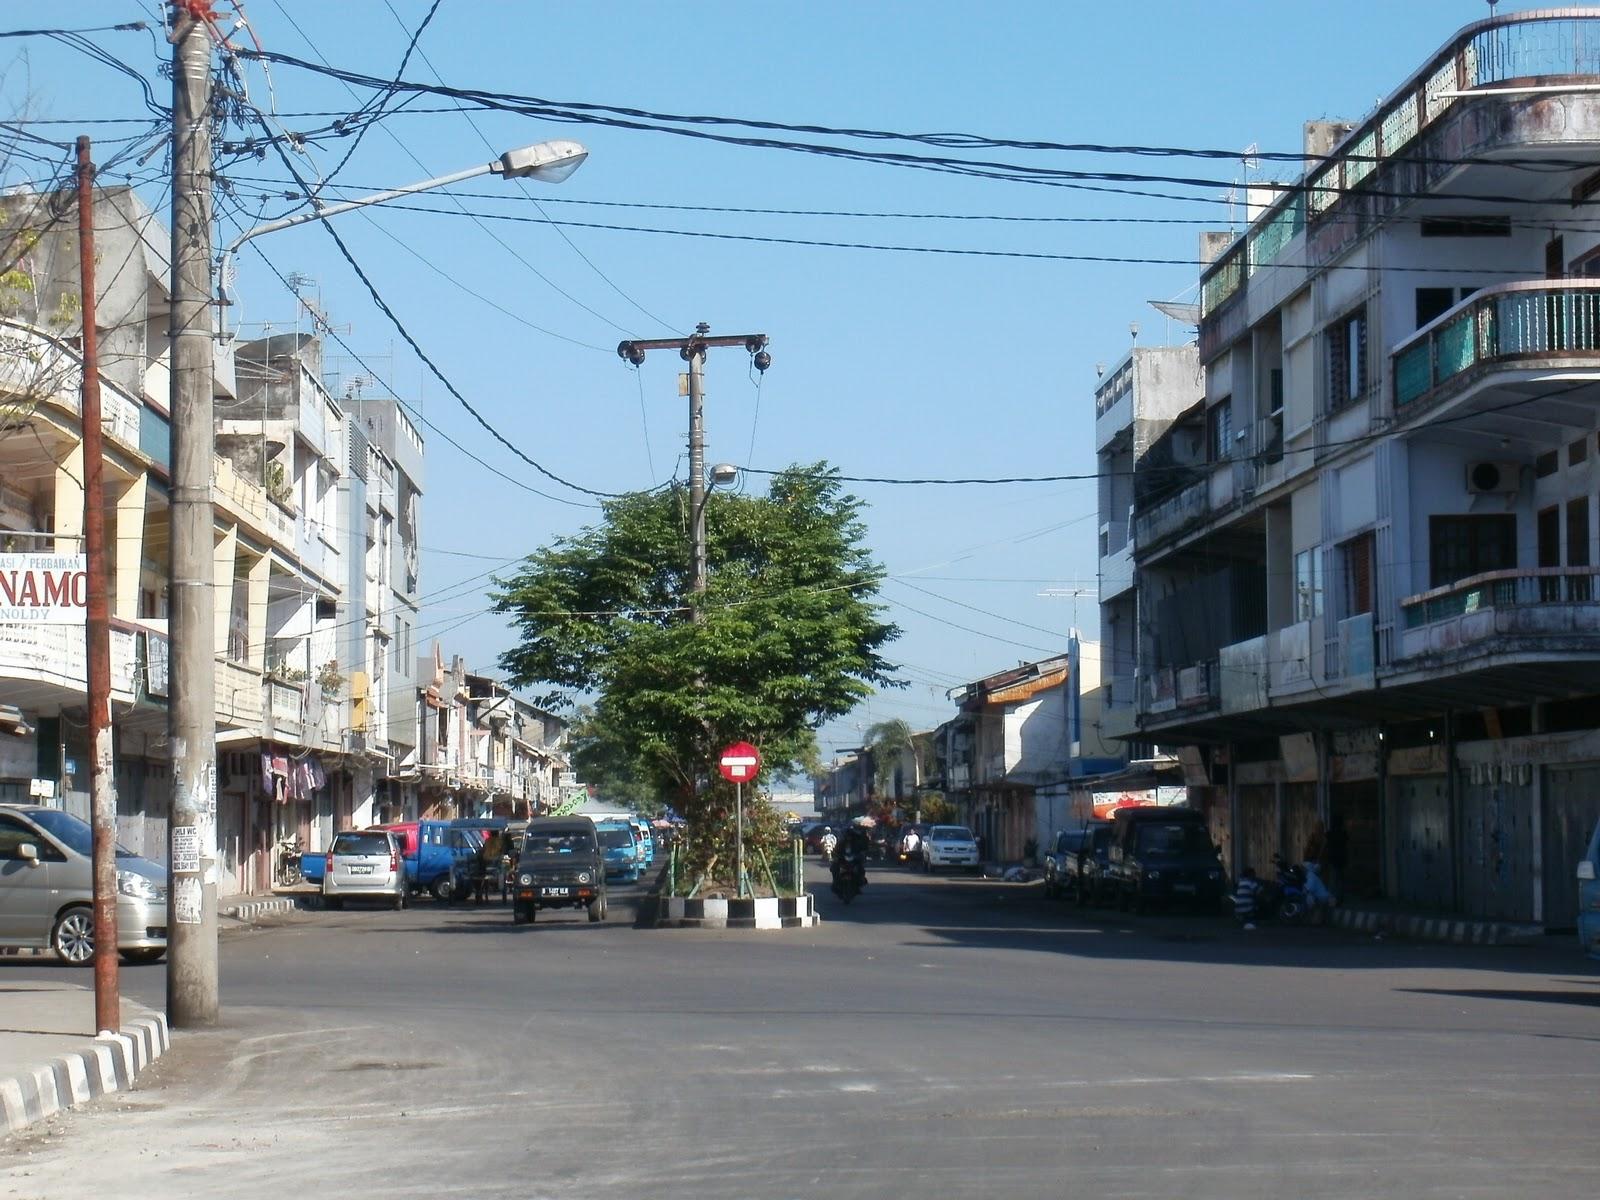 Manado Tempo Dulu Pasar Kampung Cina Perempatan Menuju Pelabuhan Bersehati